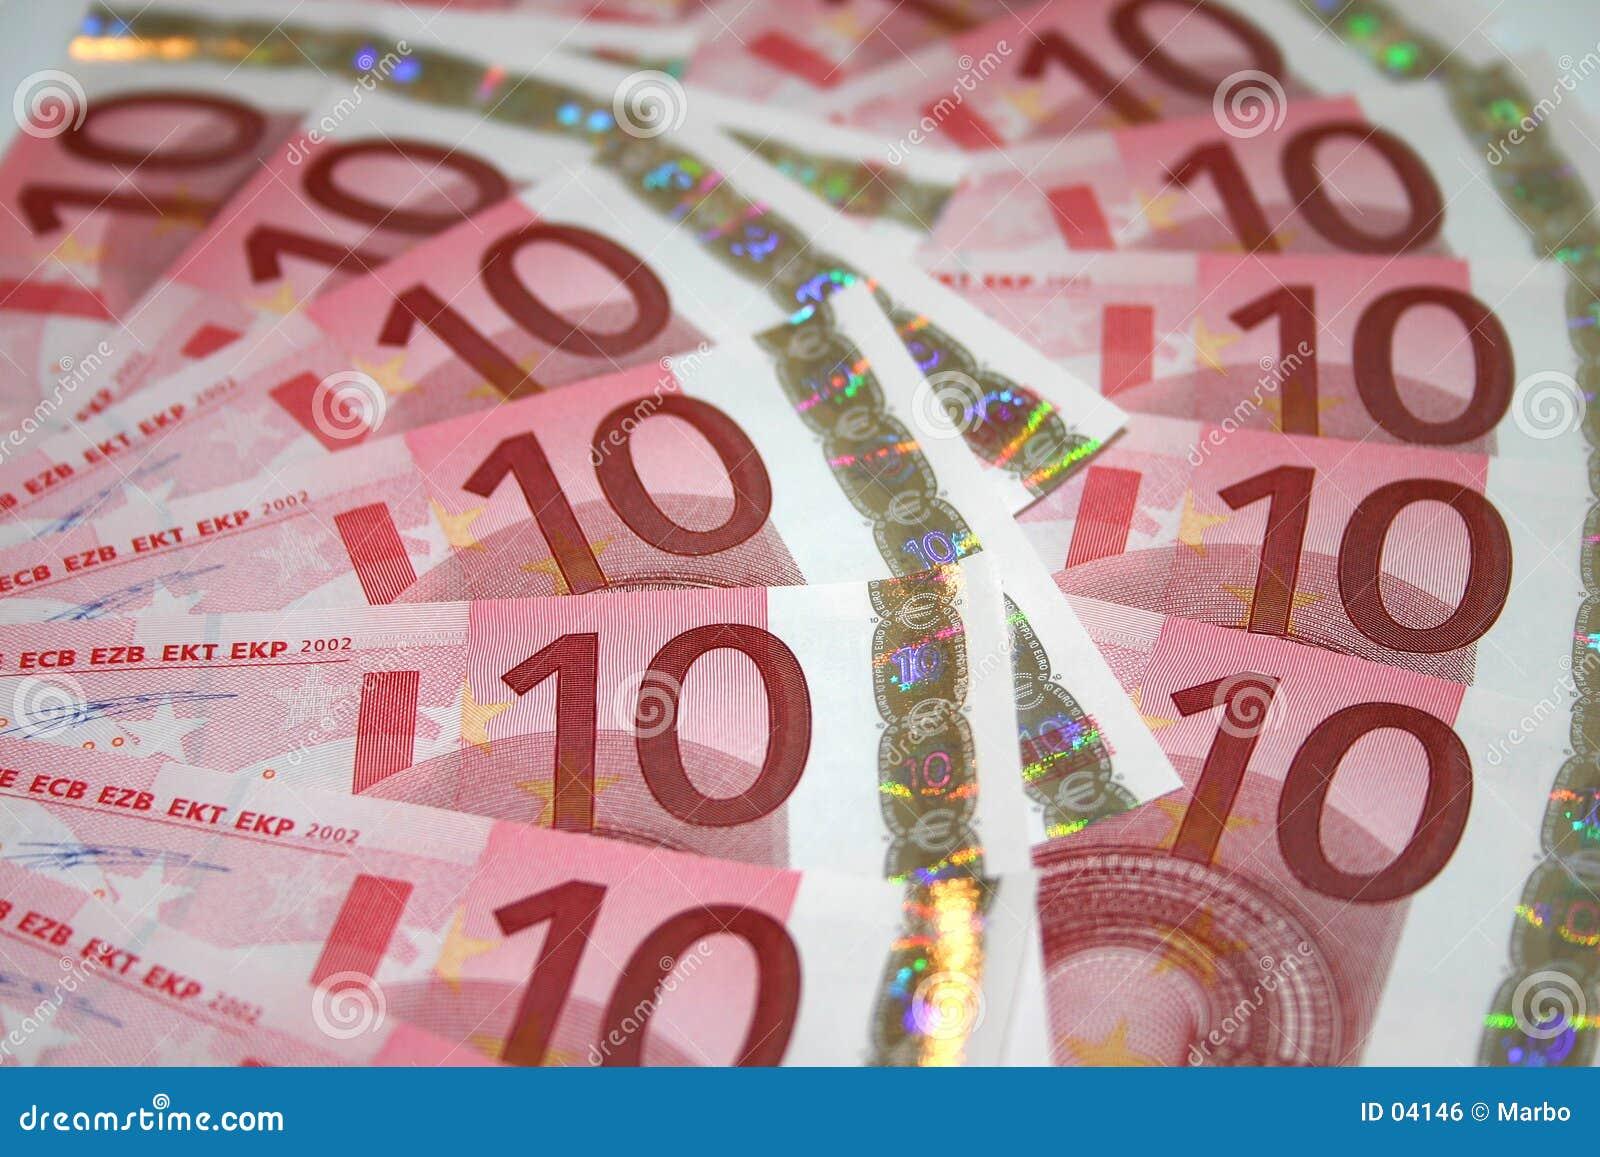 Euro 10 fatture